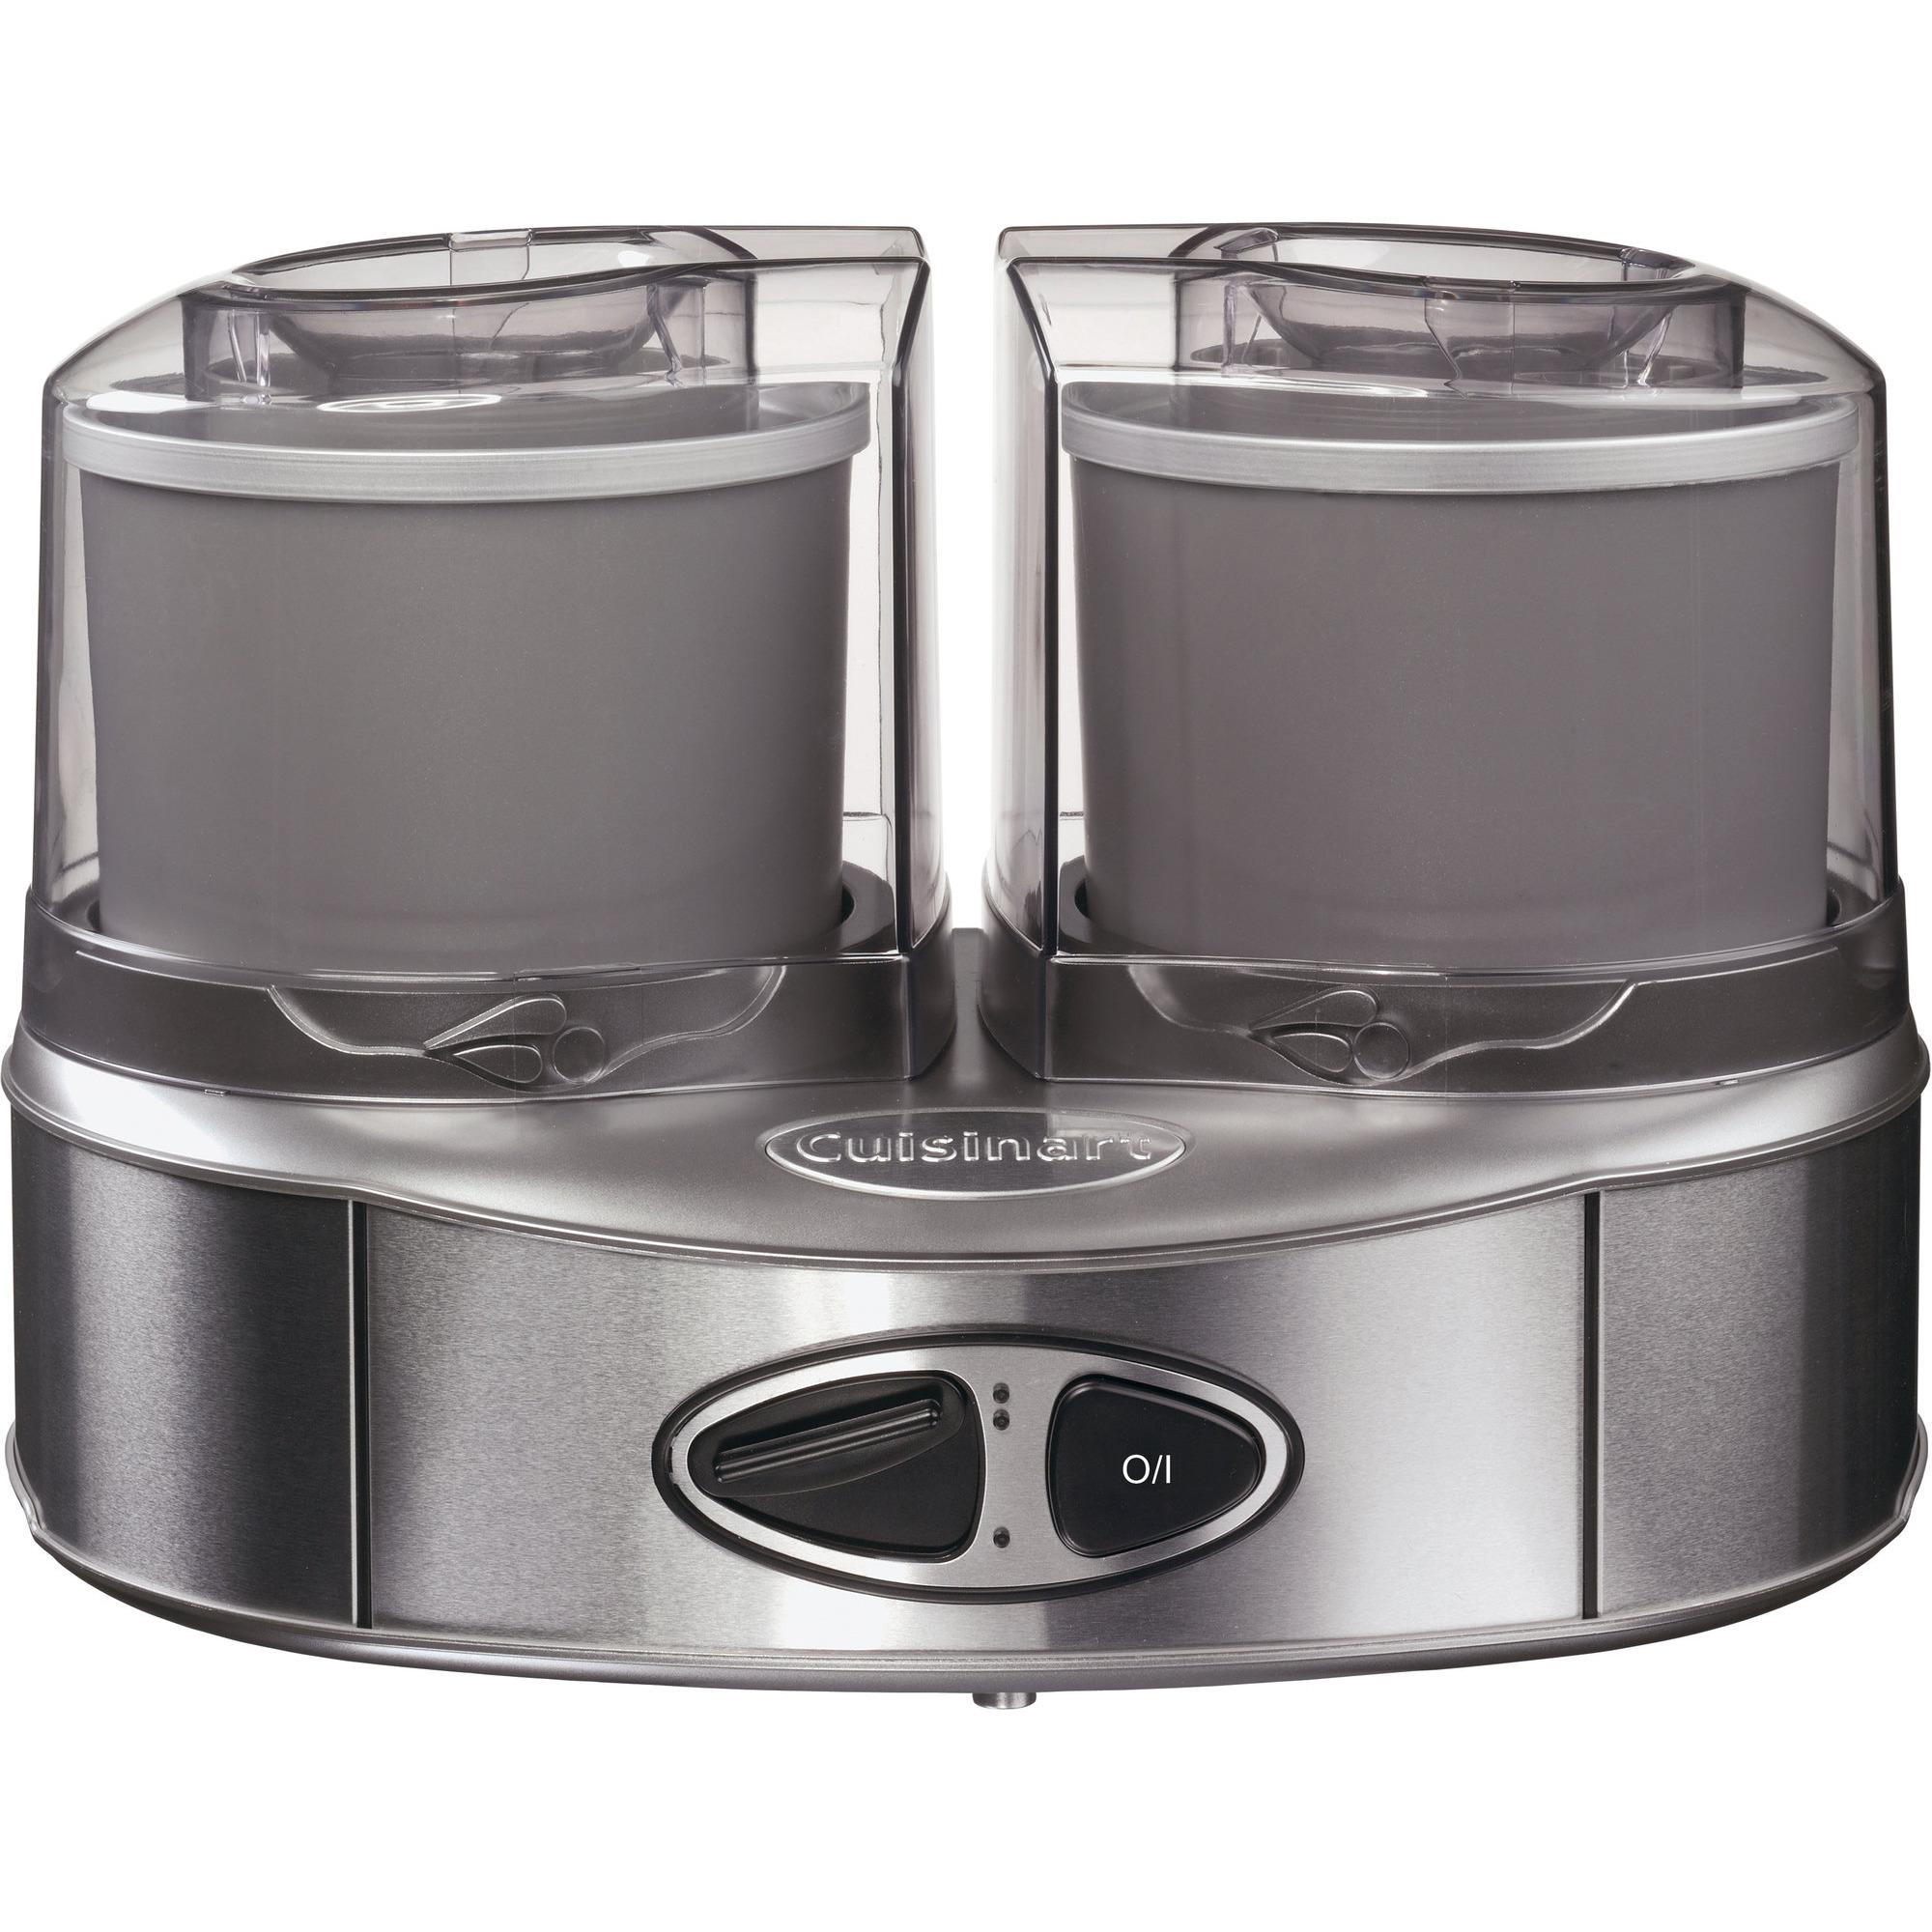 Cuisinart ICE-40 Duo – 2 x 1.0L